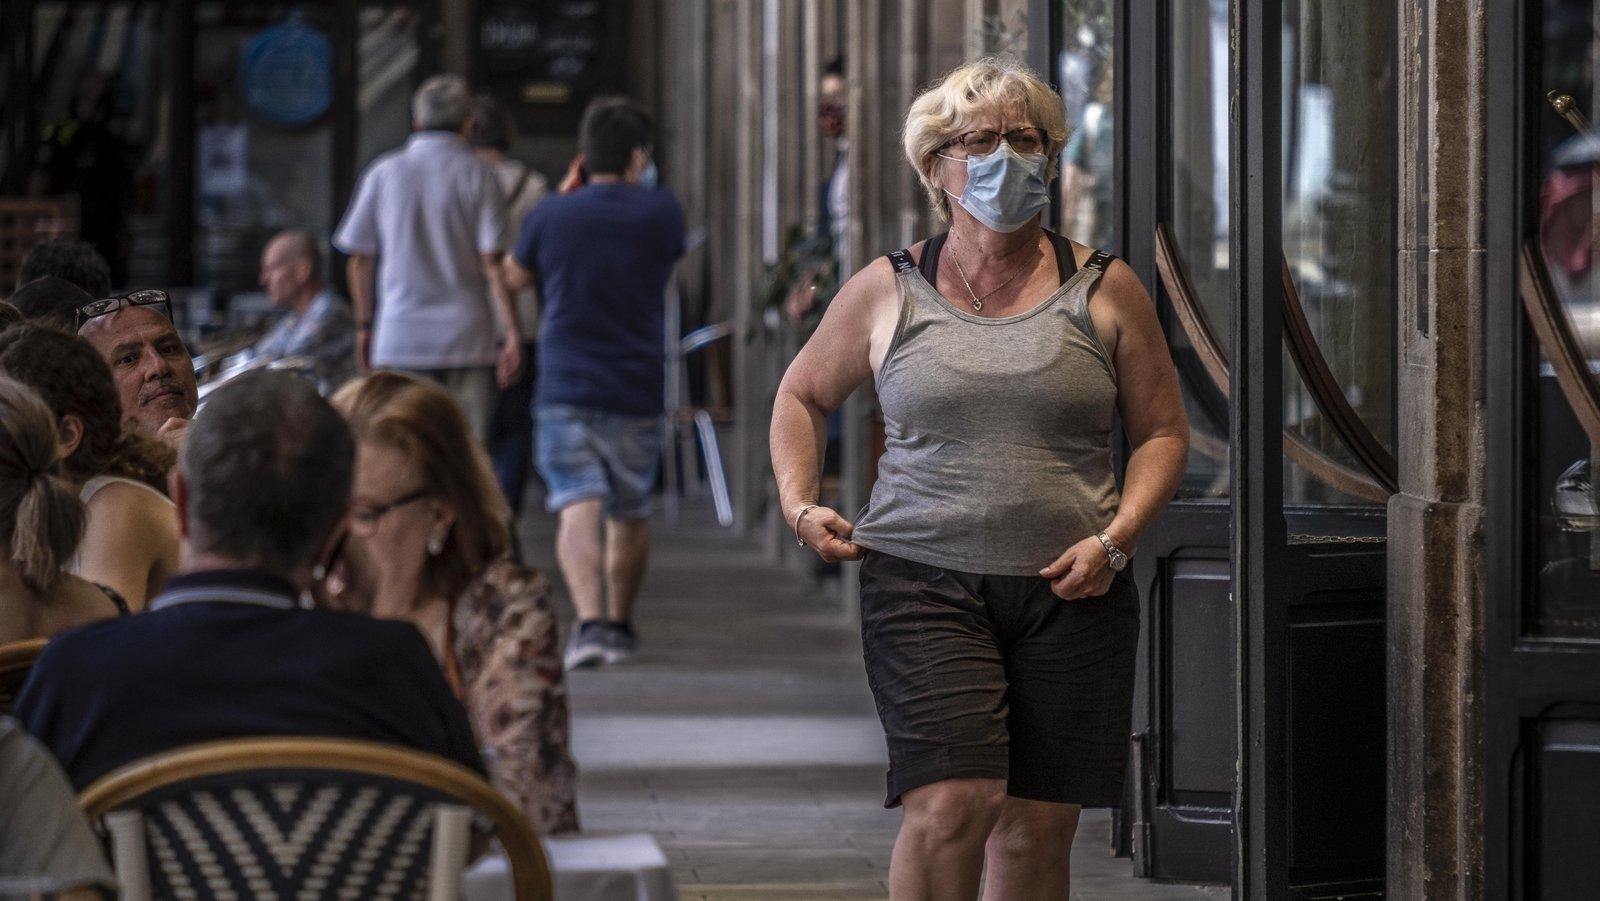 Spanish court suspends lockdown of virus-hit Catalonia